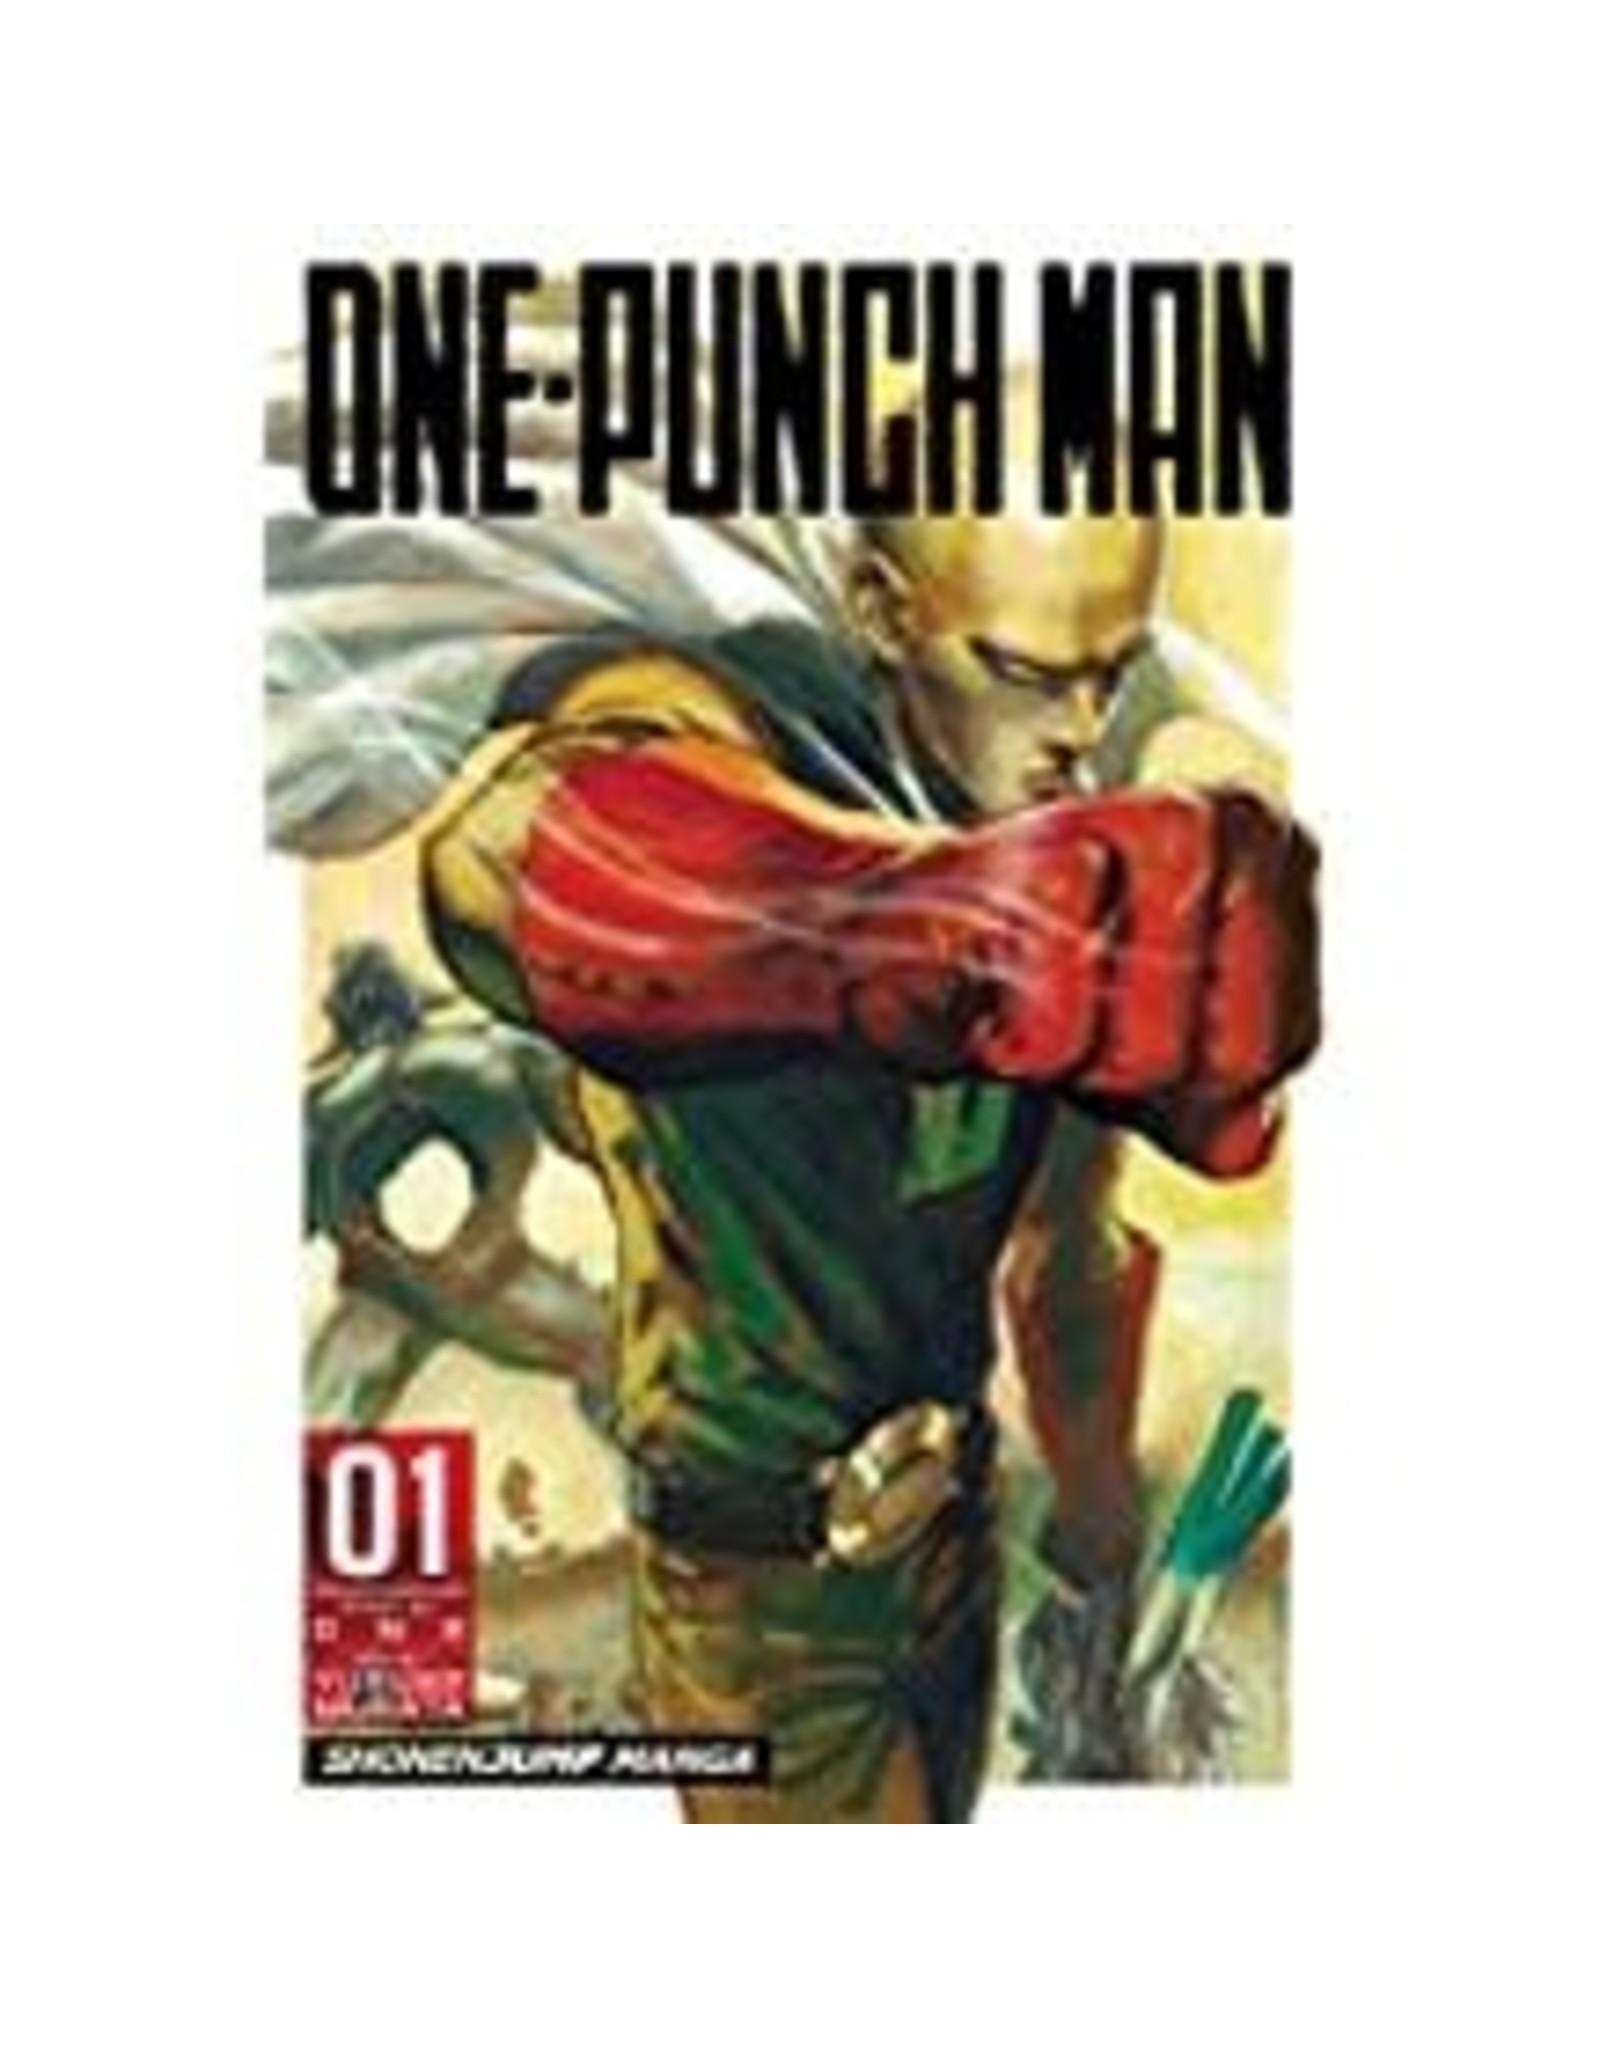 One-Punch Man Volume 01 (English Version)